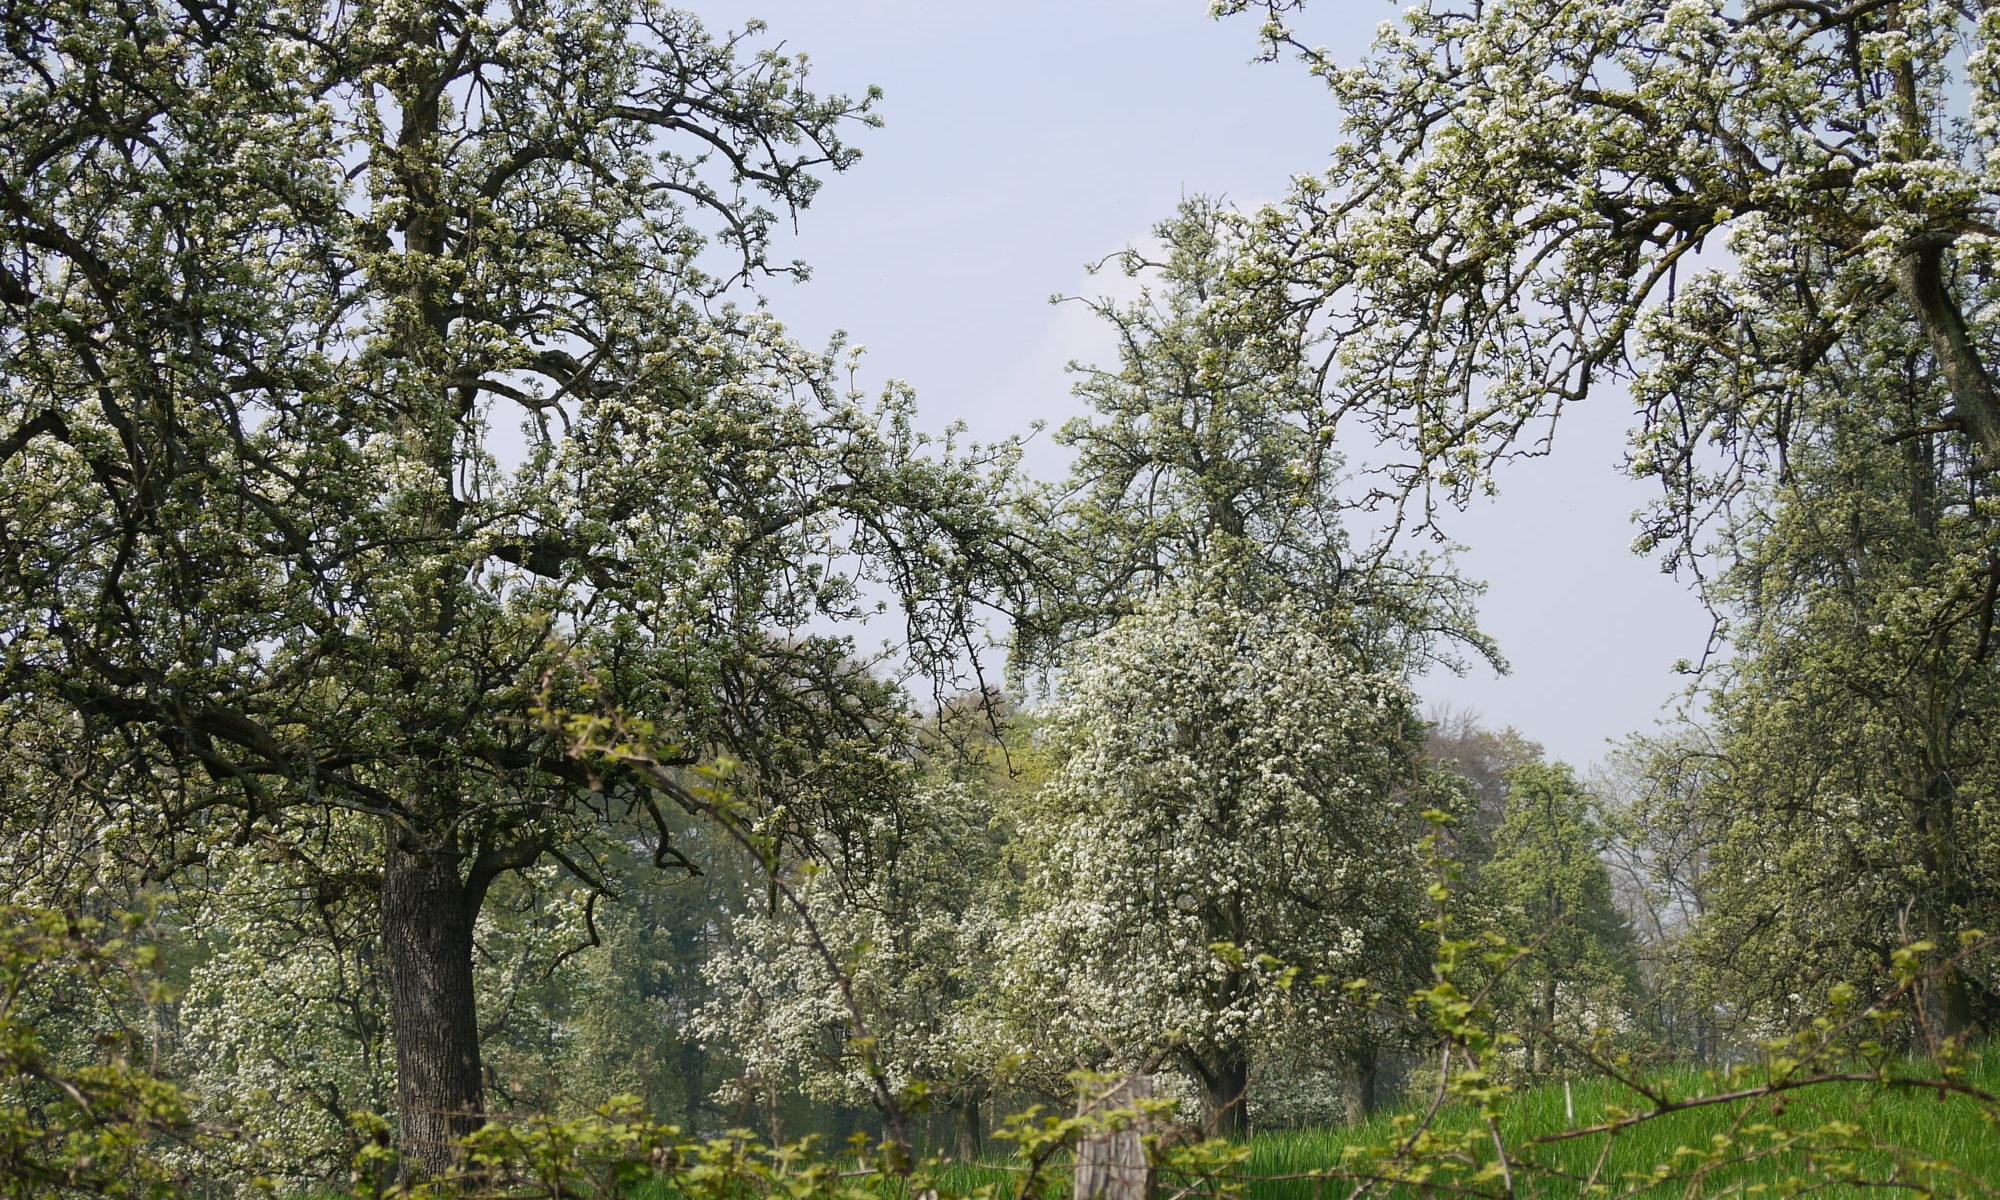 Beeindruckende blühende Birnbäume